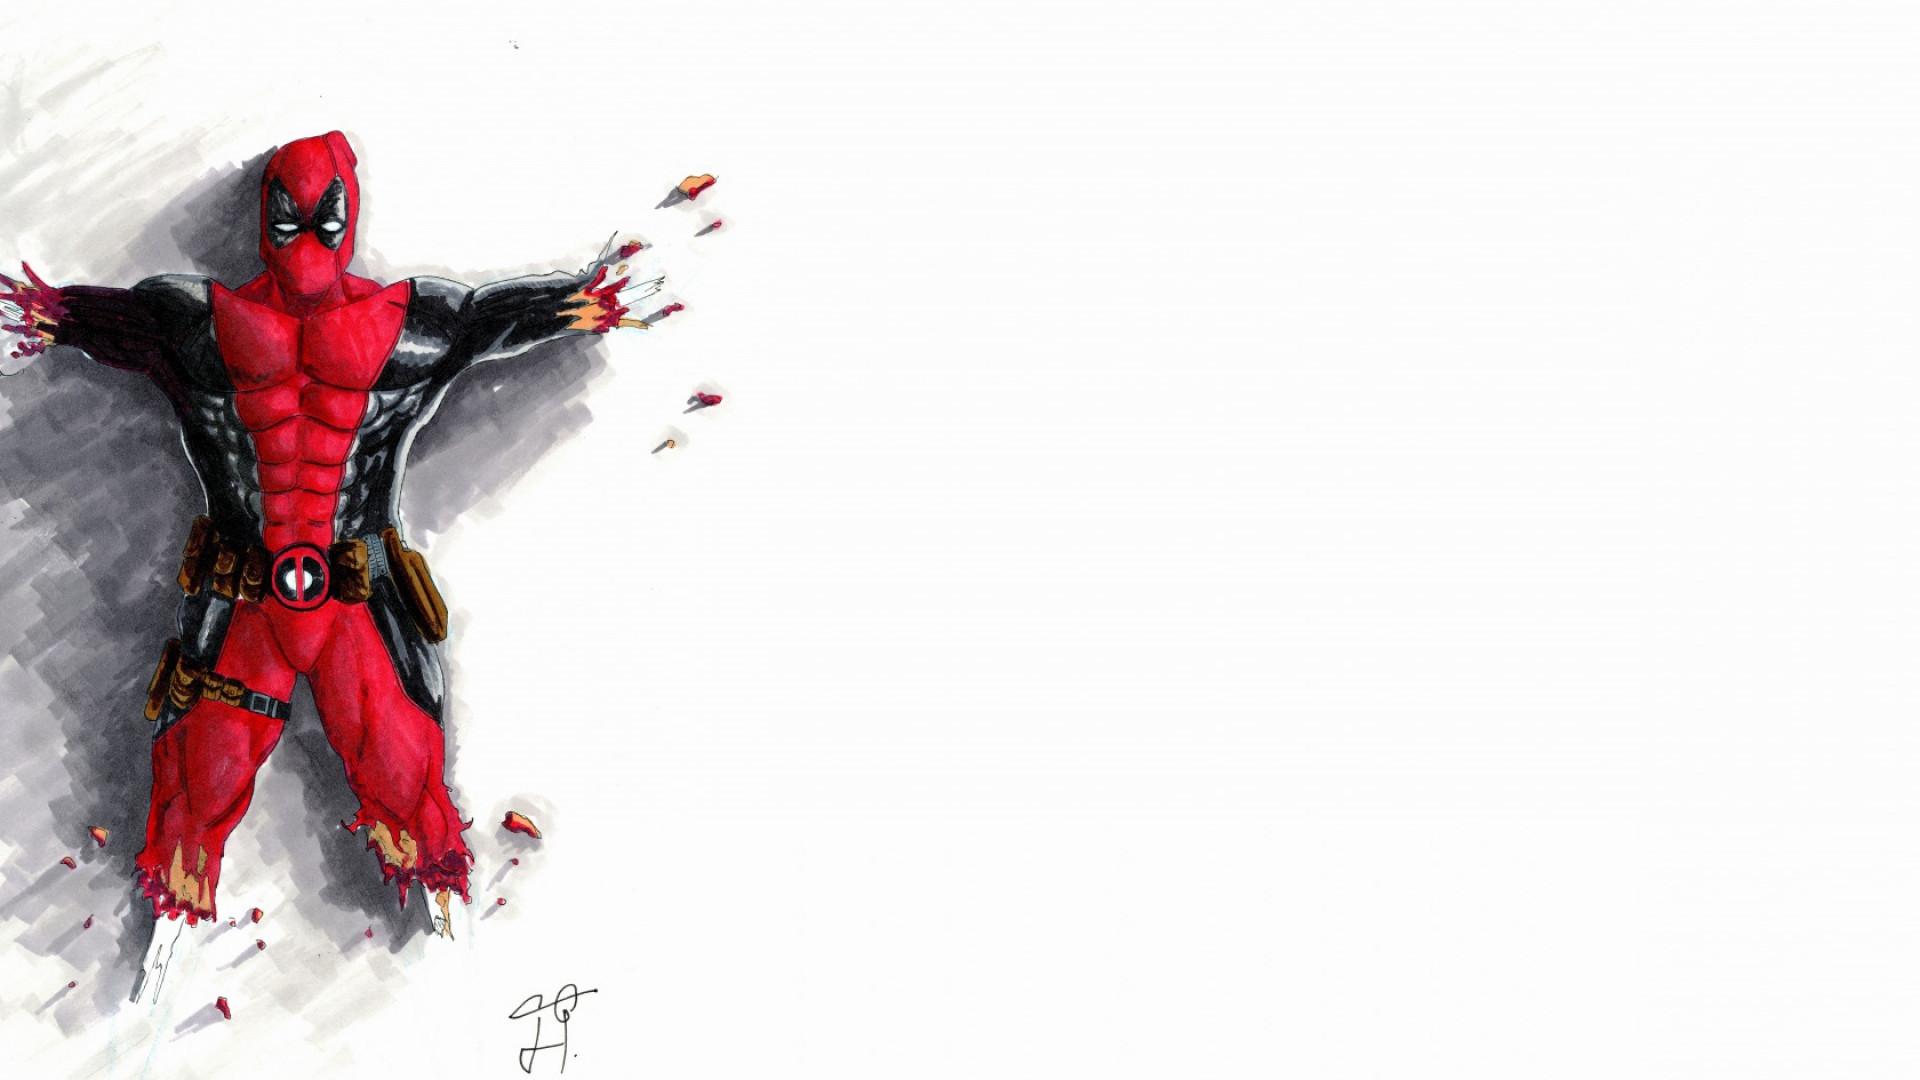 Res: 1920x1080, Dead Pool Wallpaper Full Hd 1080P Deadpool Wallpapers Hd, Desktop  Backgrounds